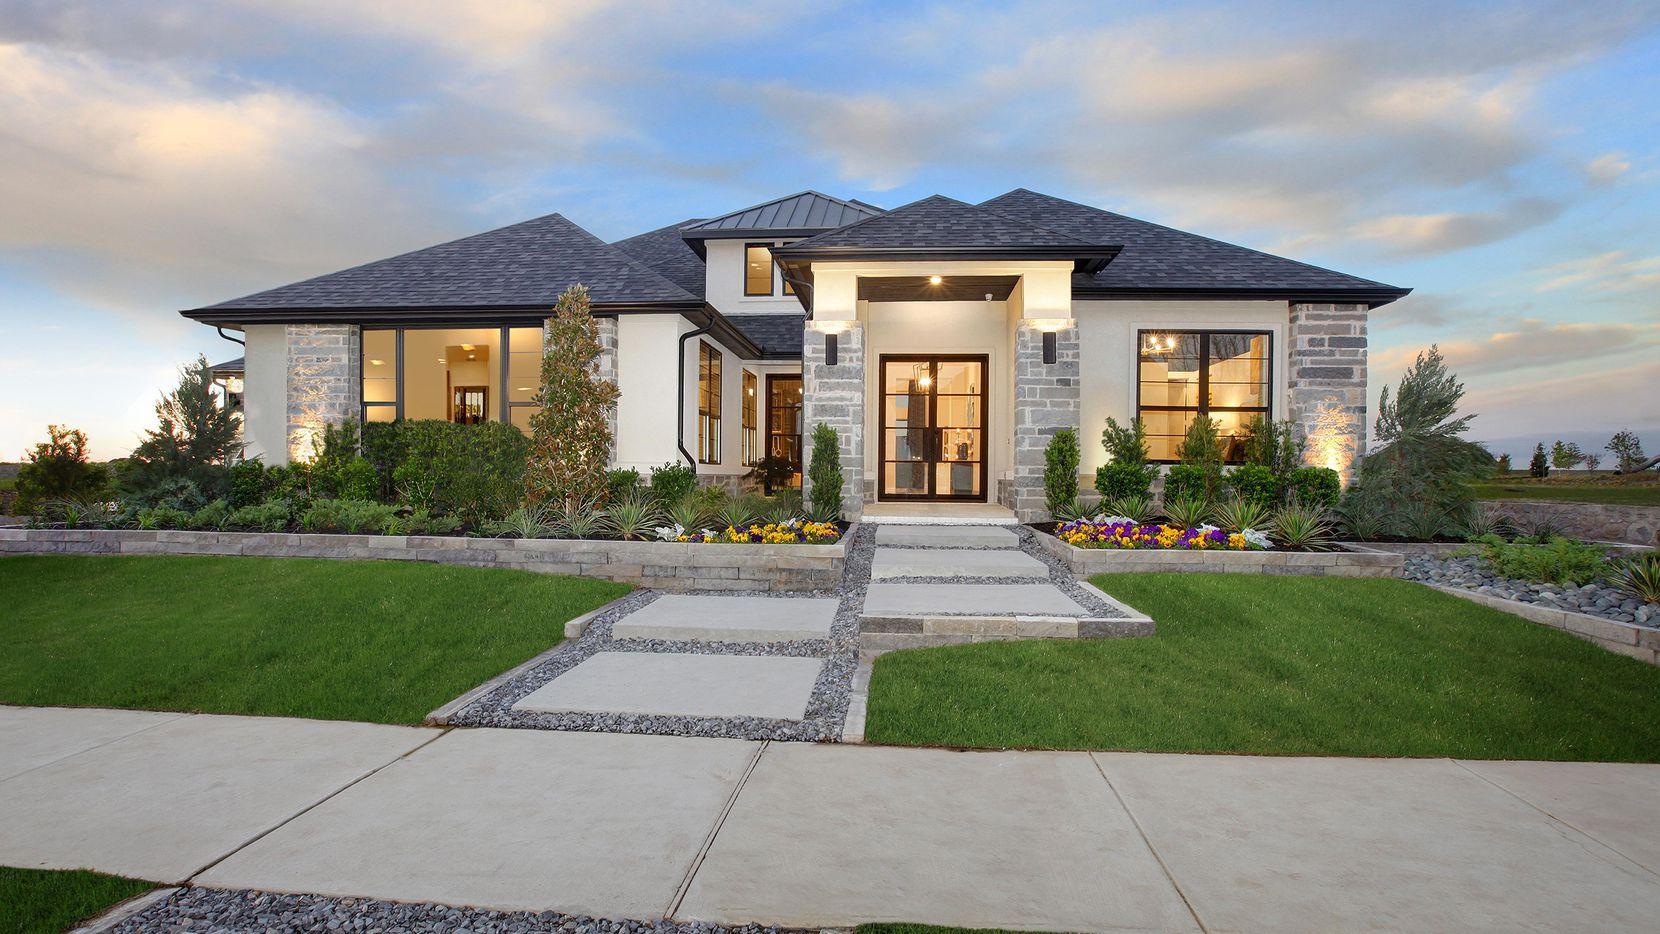 Award-winning Drees Custom Homes has opened the Lauren II model in Legacy Gardens, a master-planned community in Prosper.